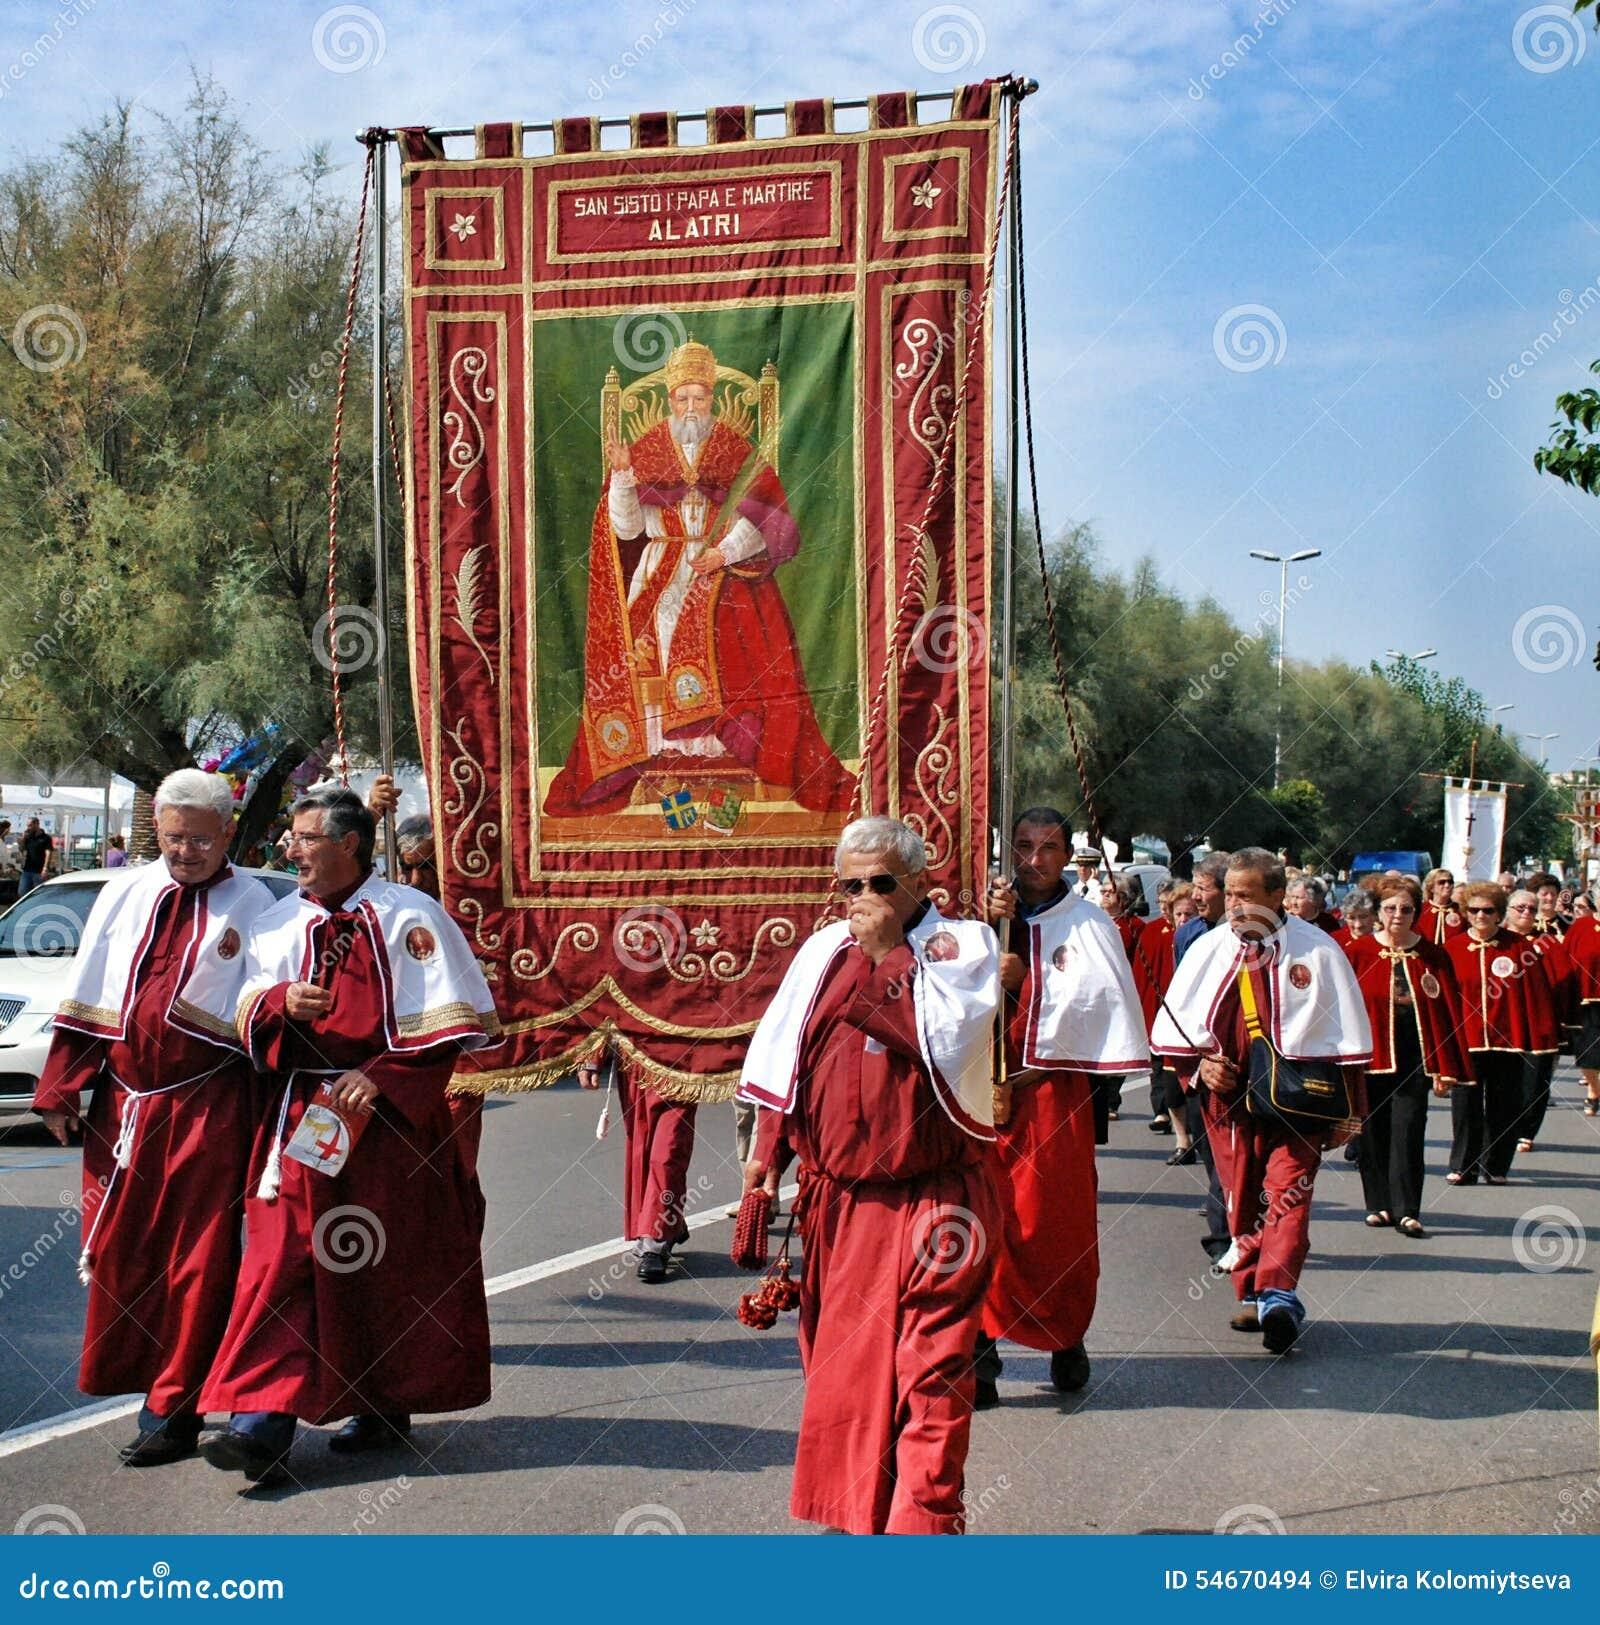 Catholic Religious Festival On September 27 In Civitavecchia ...